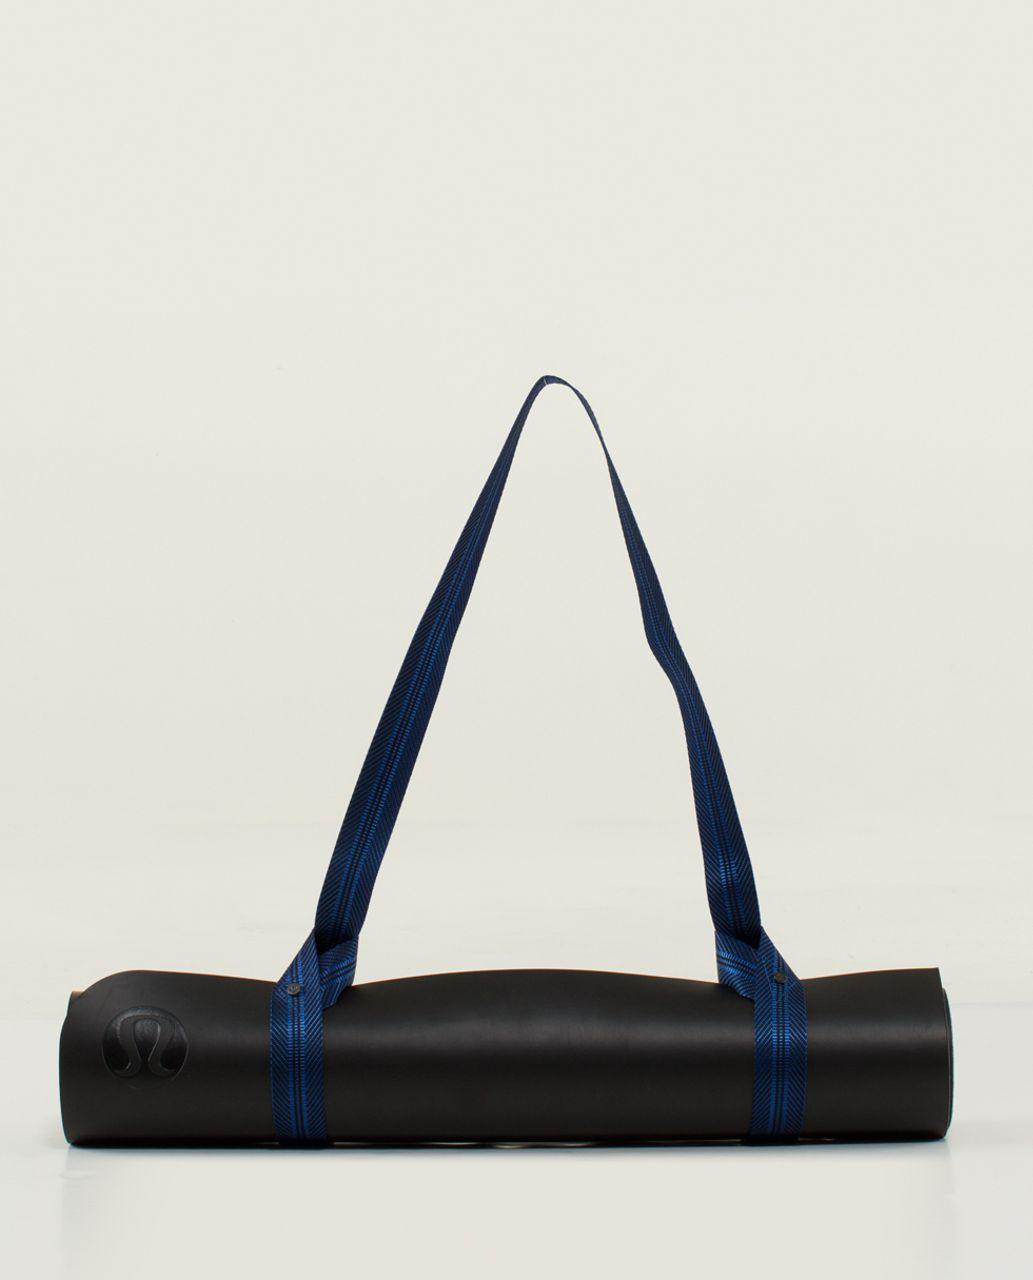 fanatics item lulu yoga mat strap caspian lululemon brainer blue no